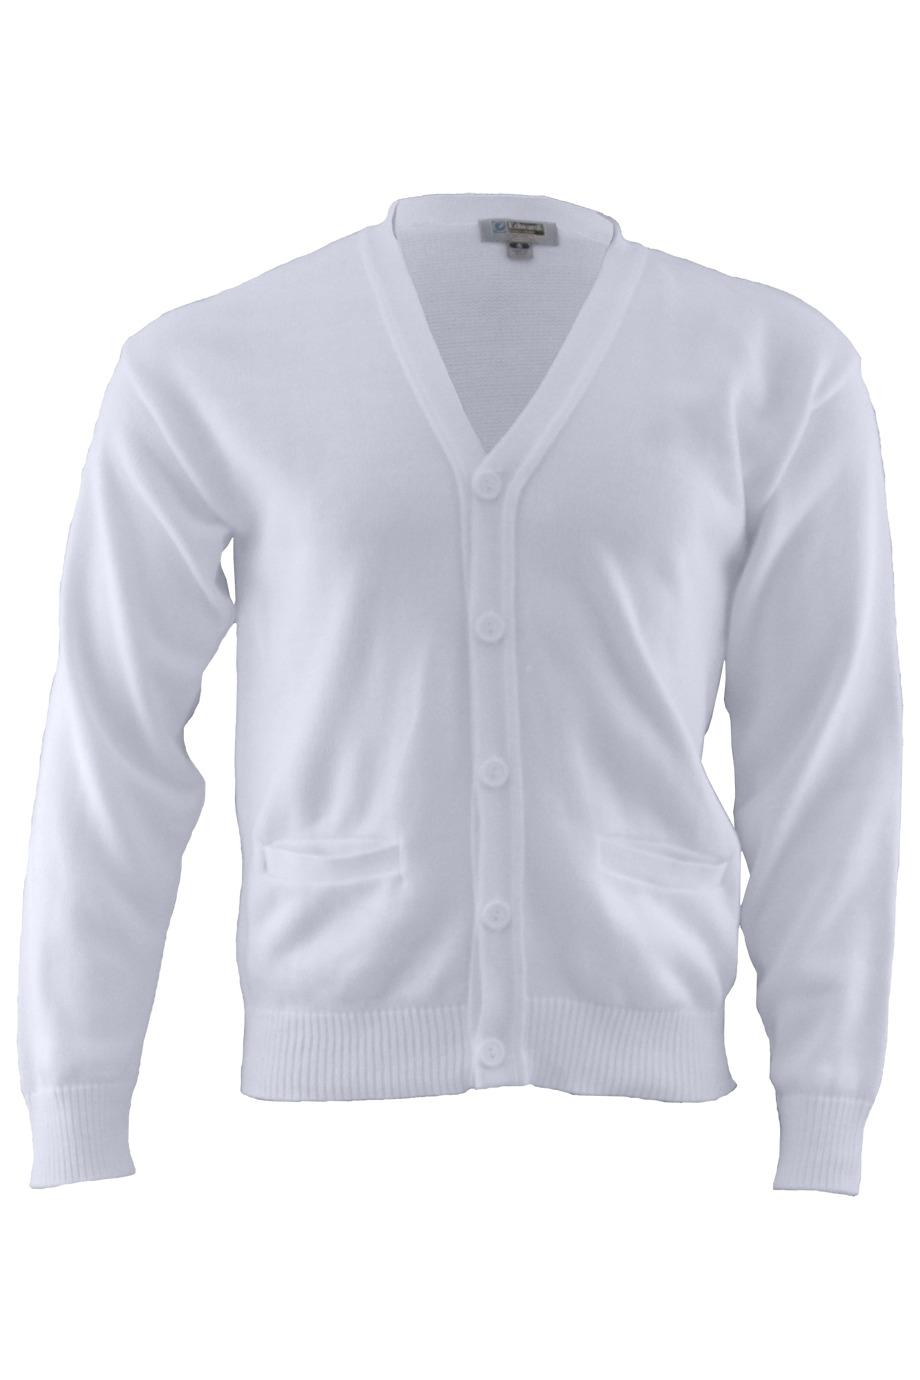 Edwards Garment 350 - V-Neck Pocket Cardigan e05c5c3b5